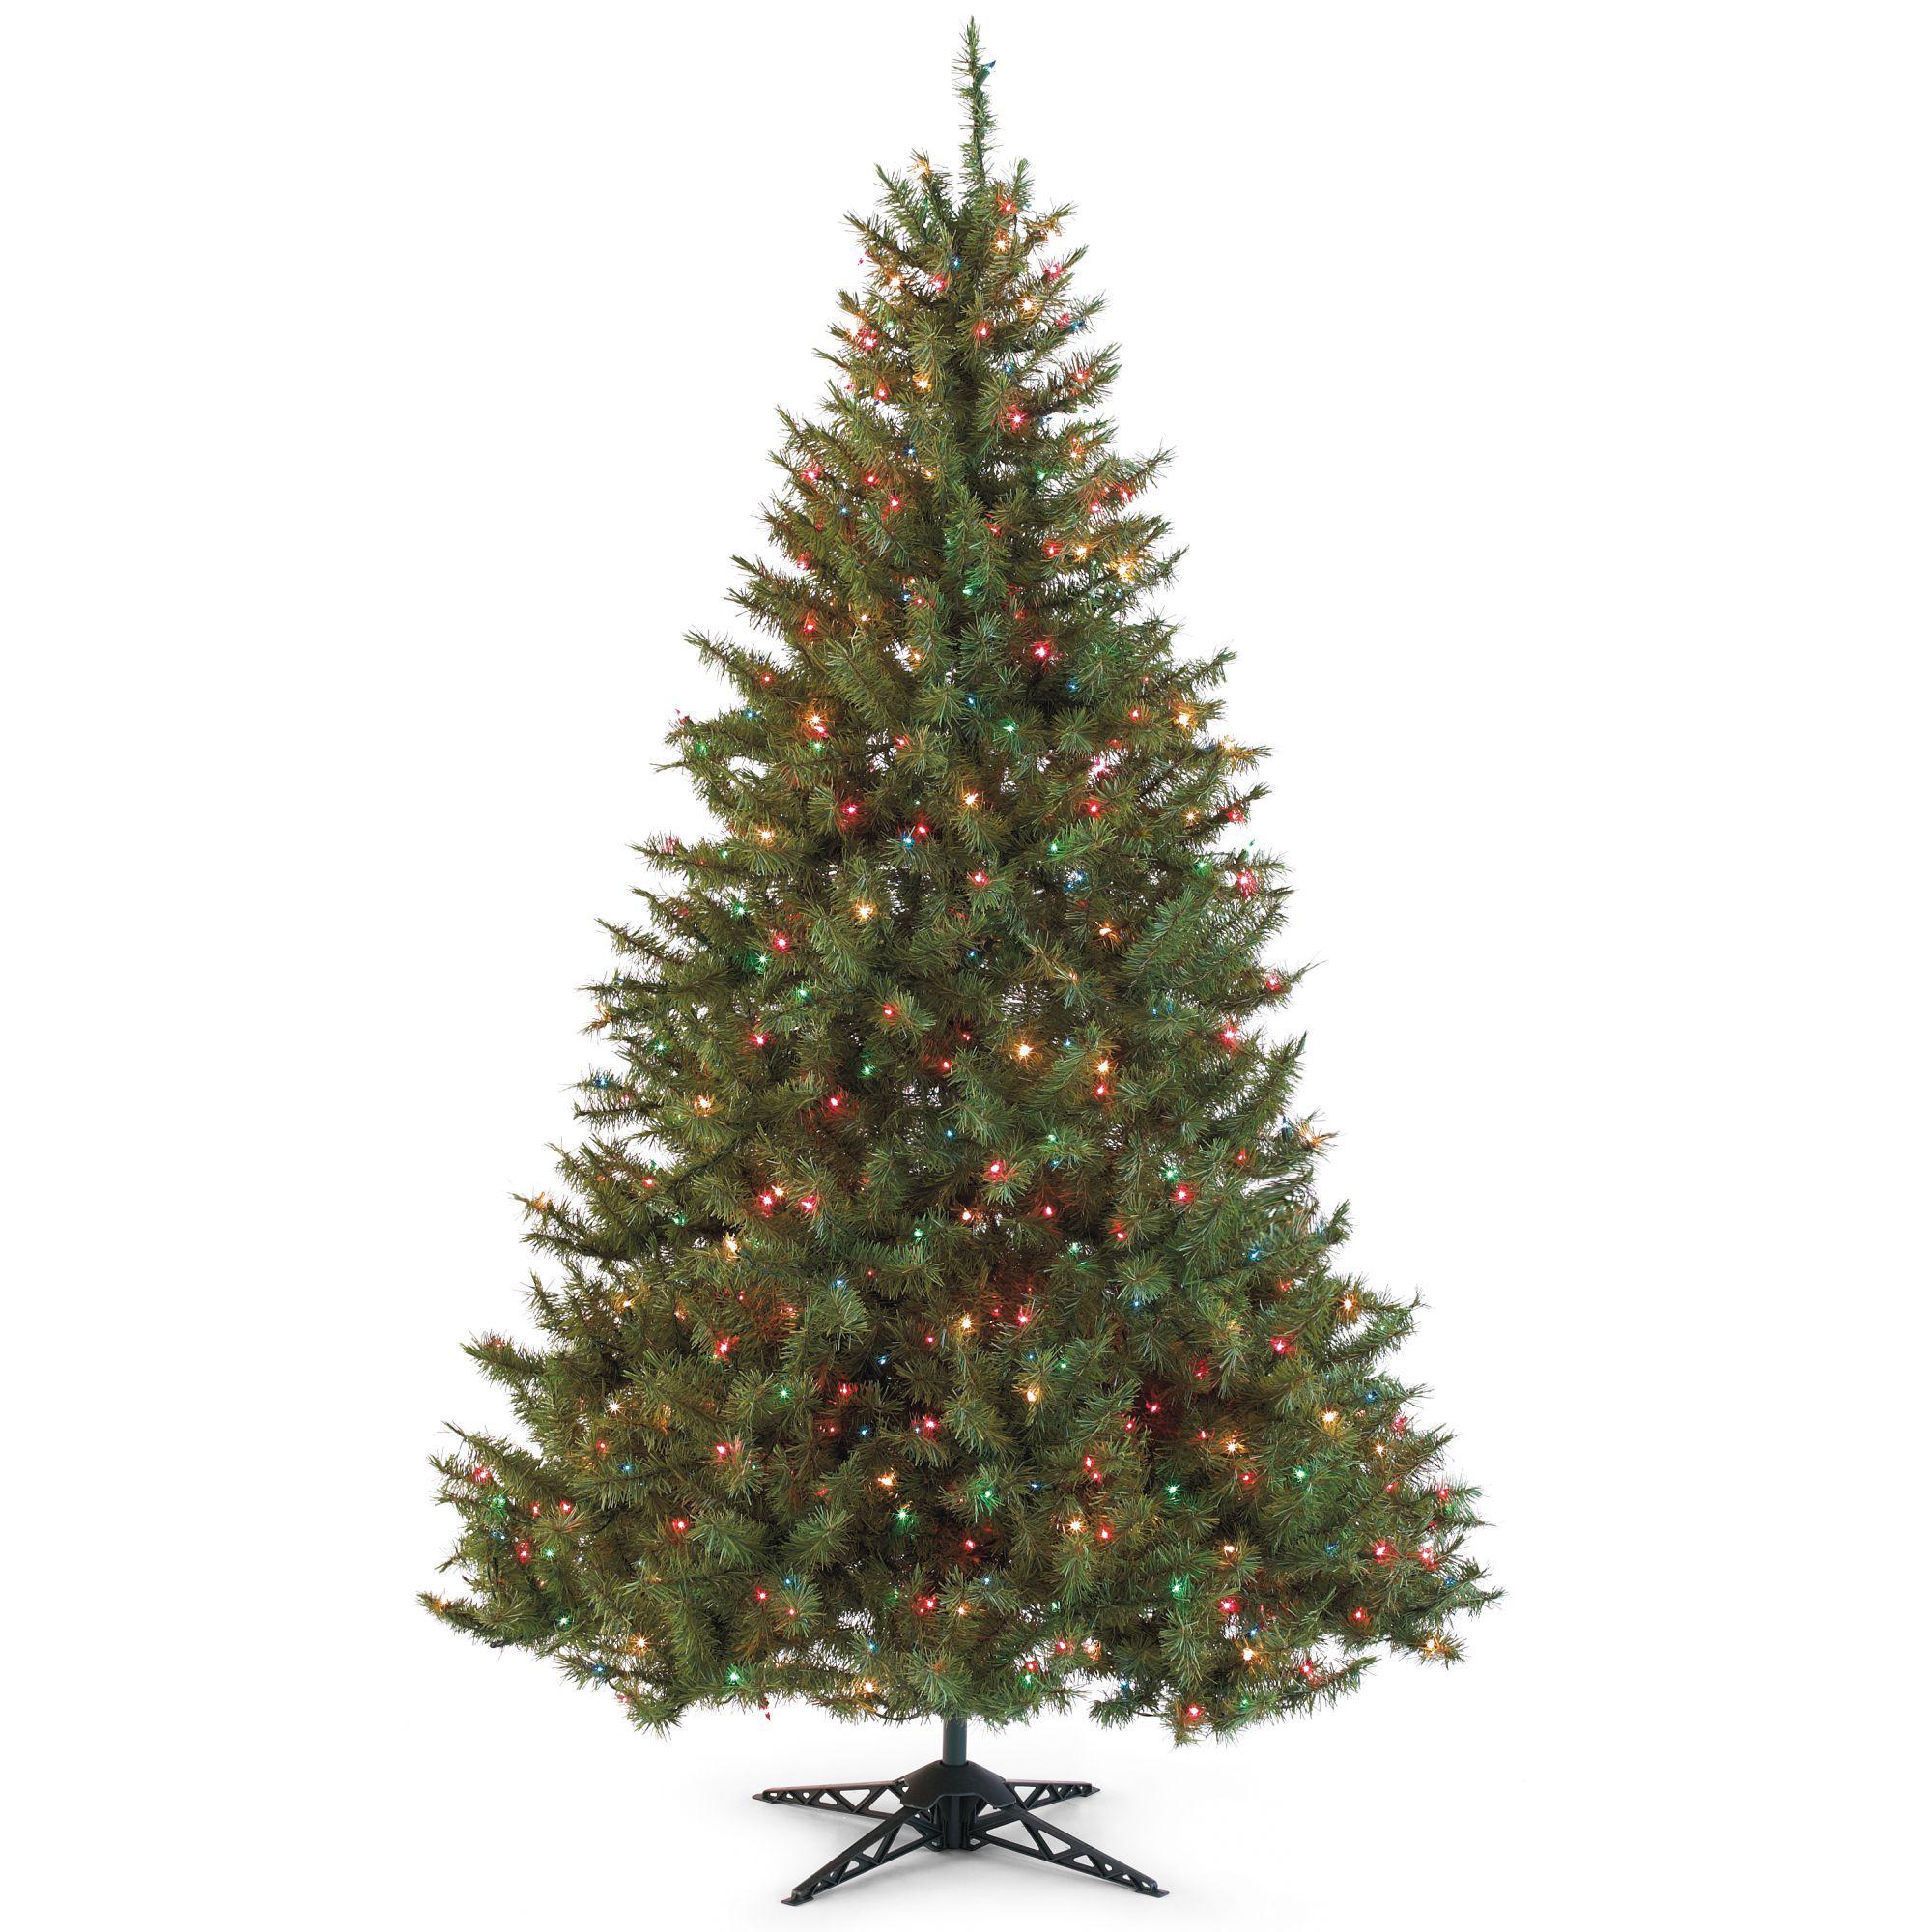 9' Slim Pre-Lit Balsam Fir Christmas Tree